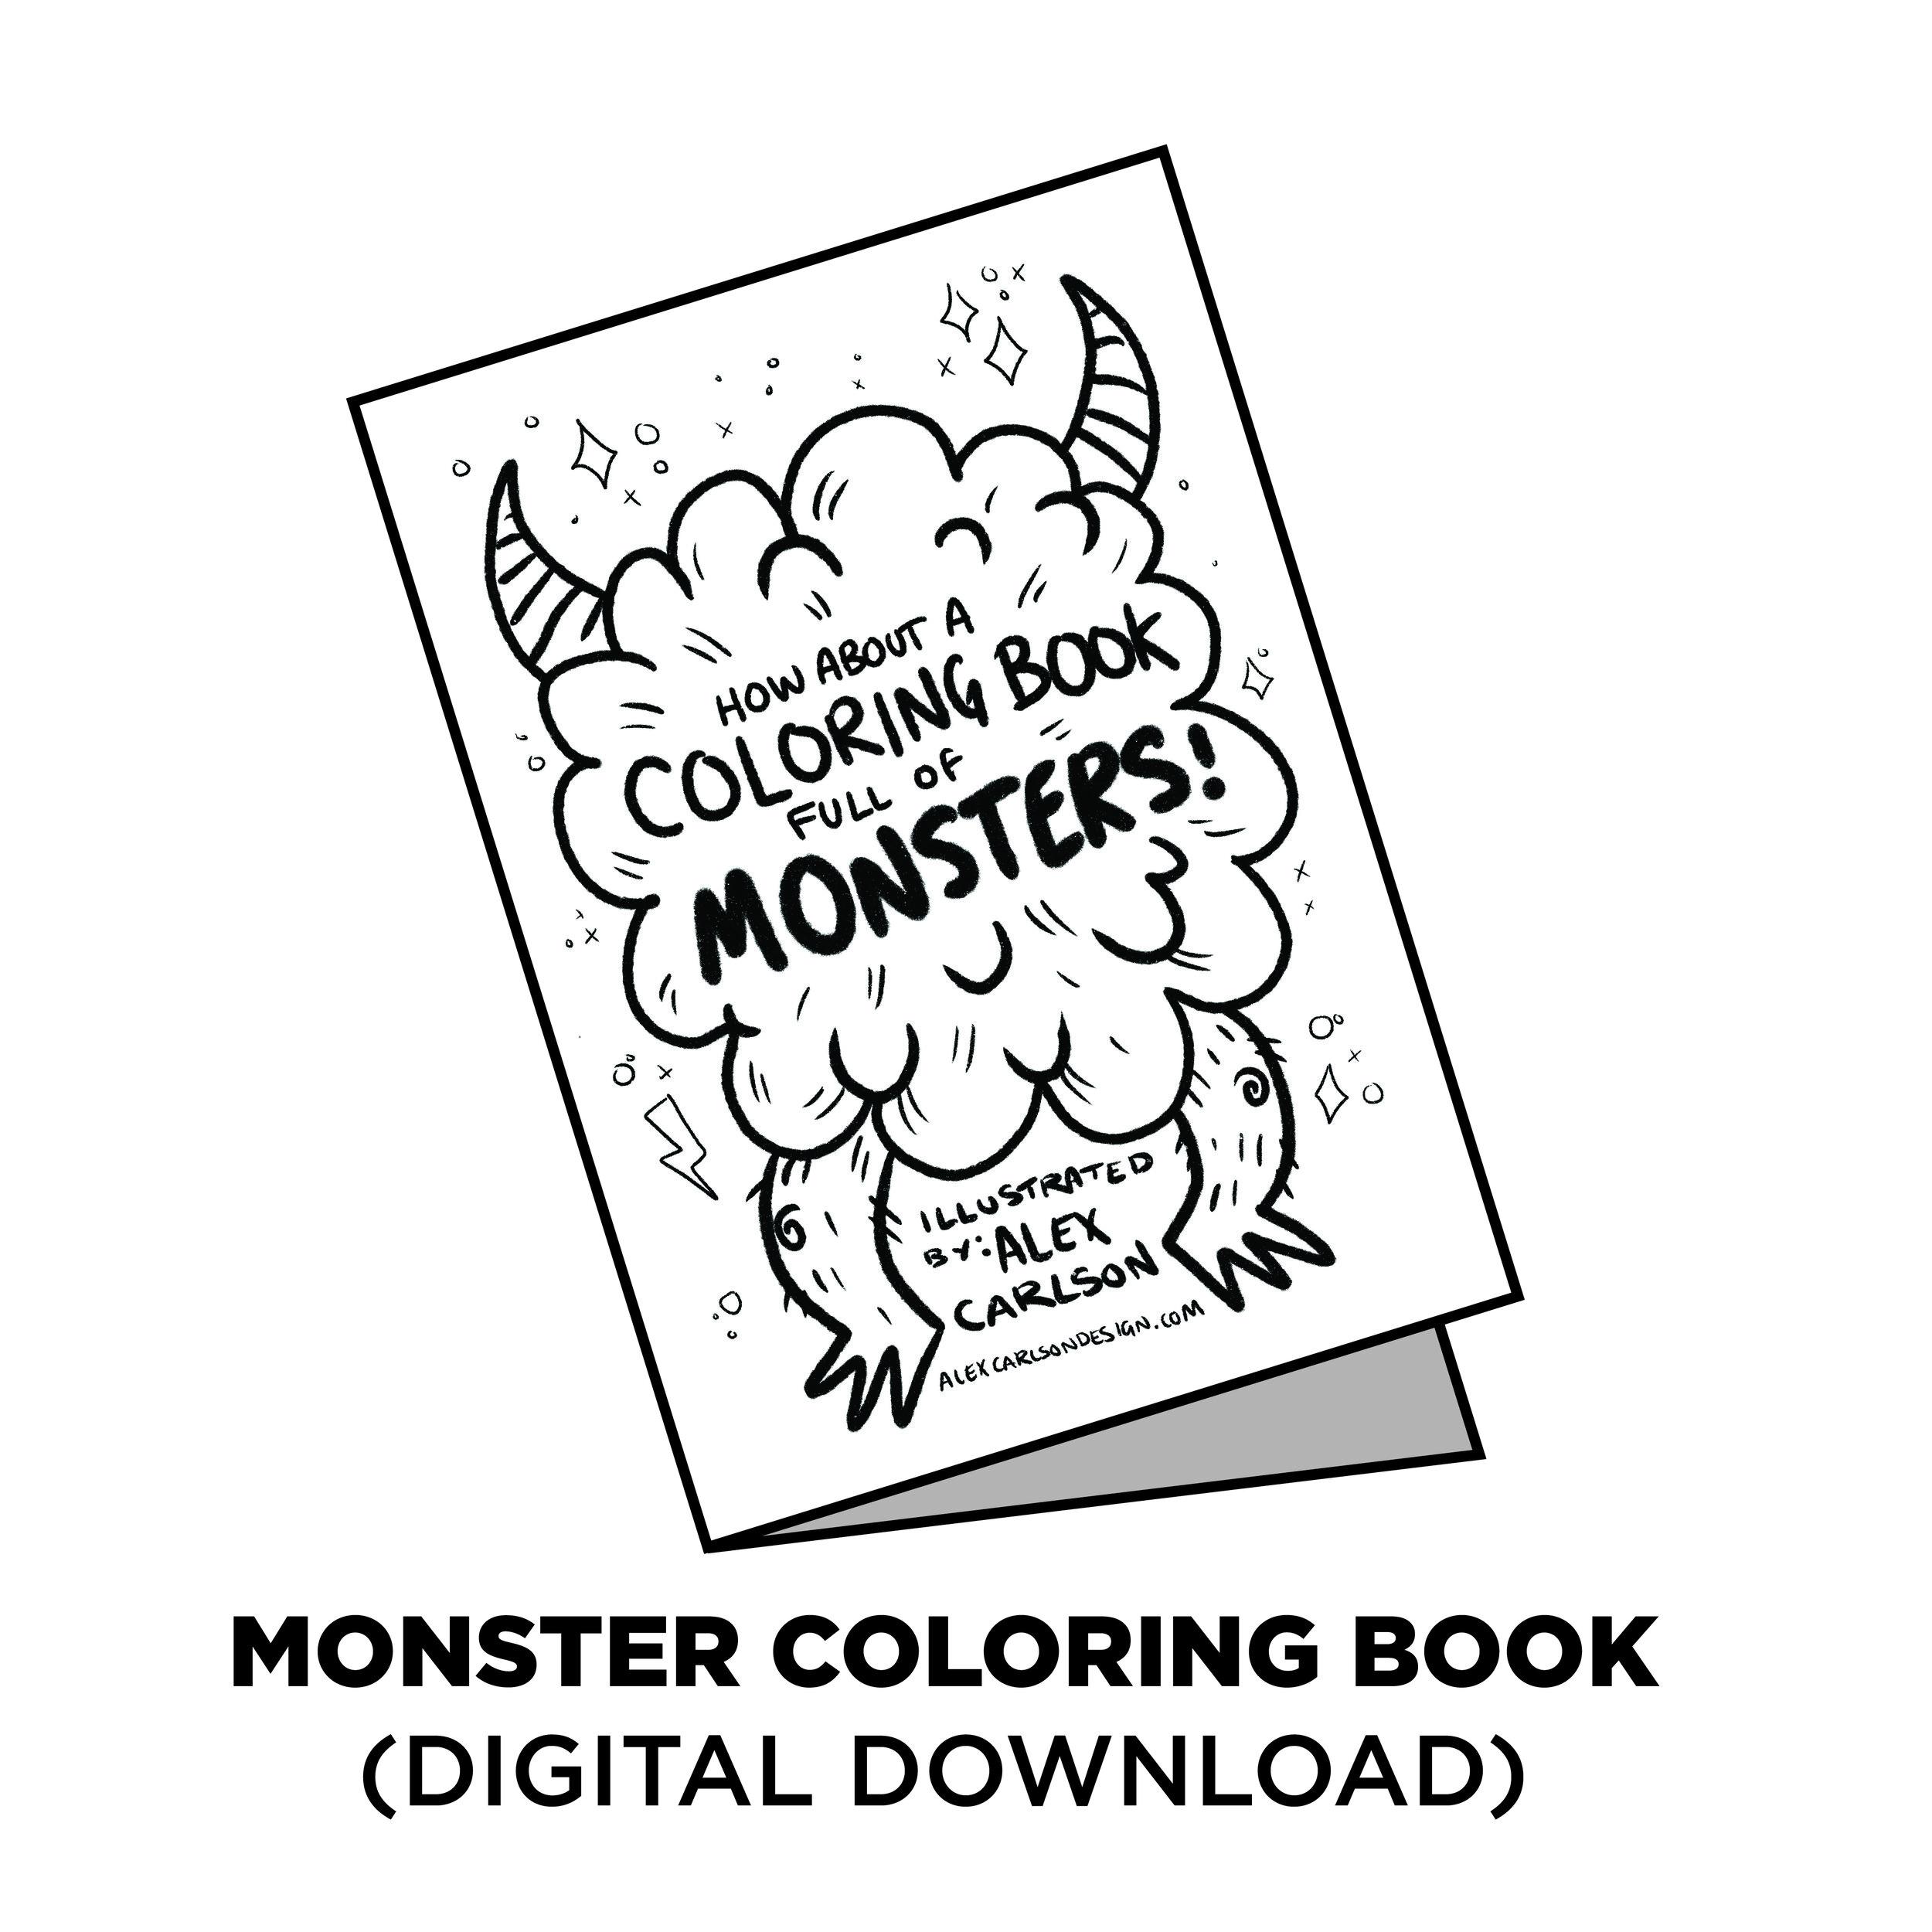 - MONSTER COLORING BOOK Free Digital Download — ALEX CARLSON, DESIGN